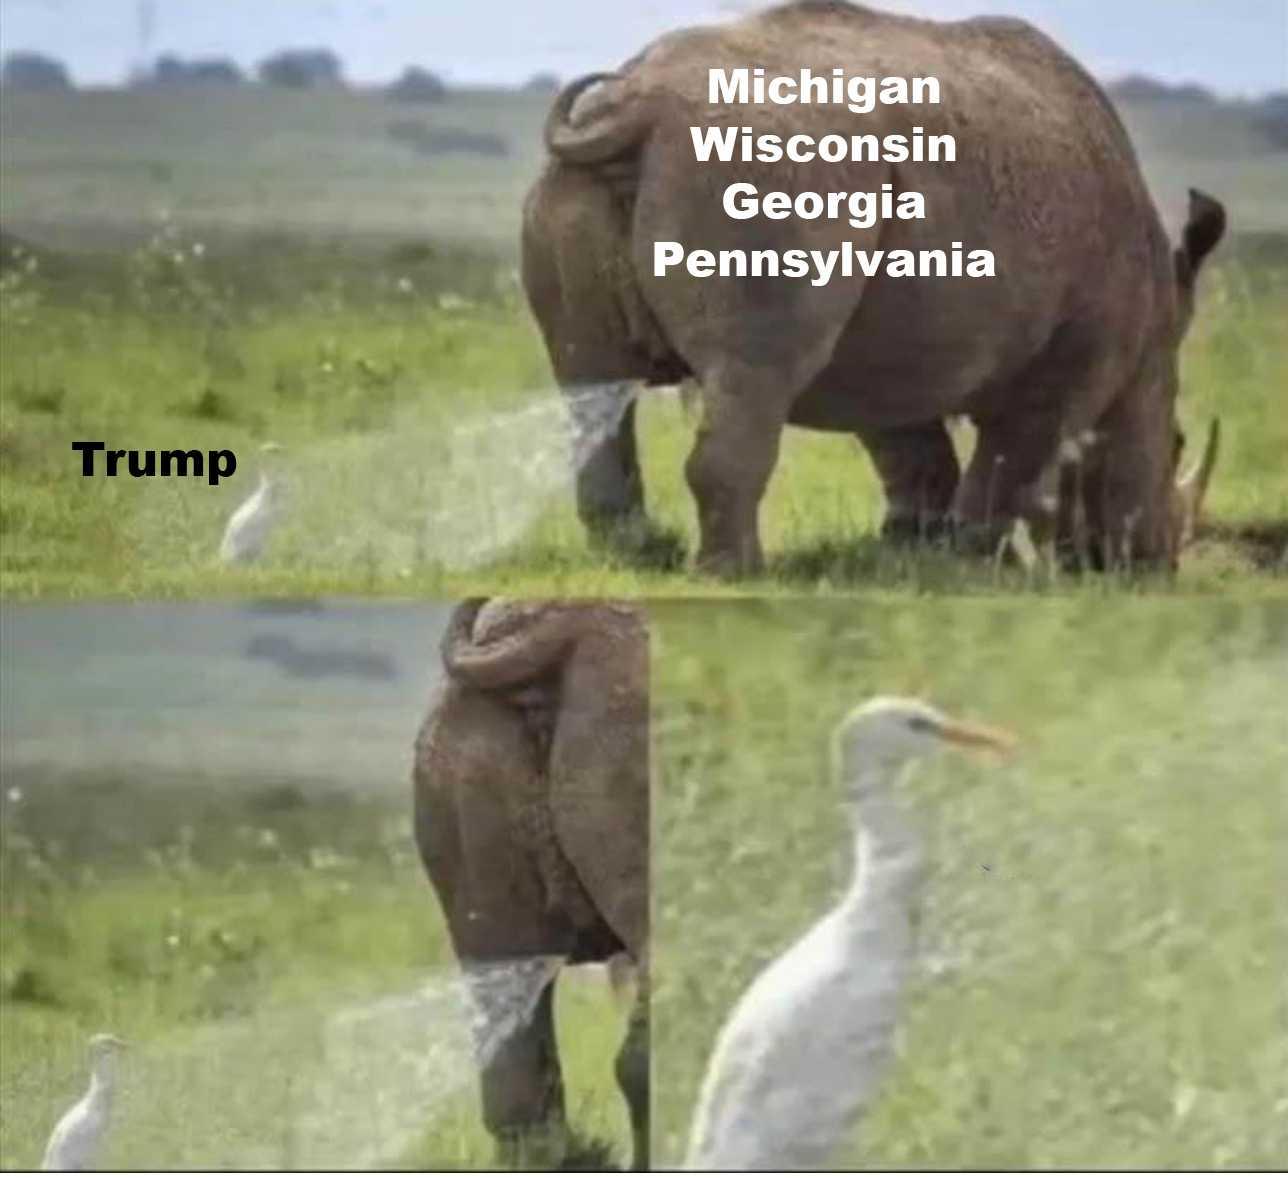 trump election defeat memes - mi wi pa ga